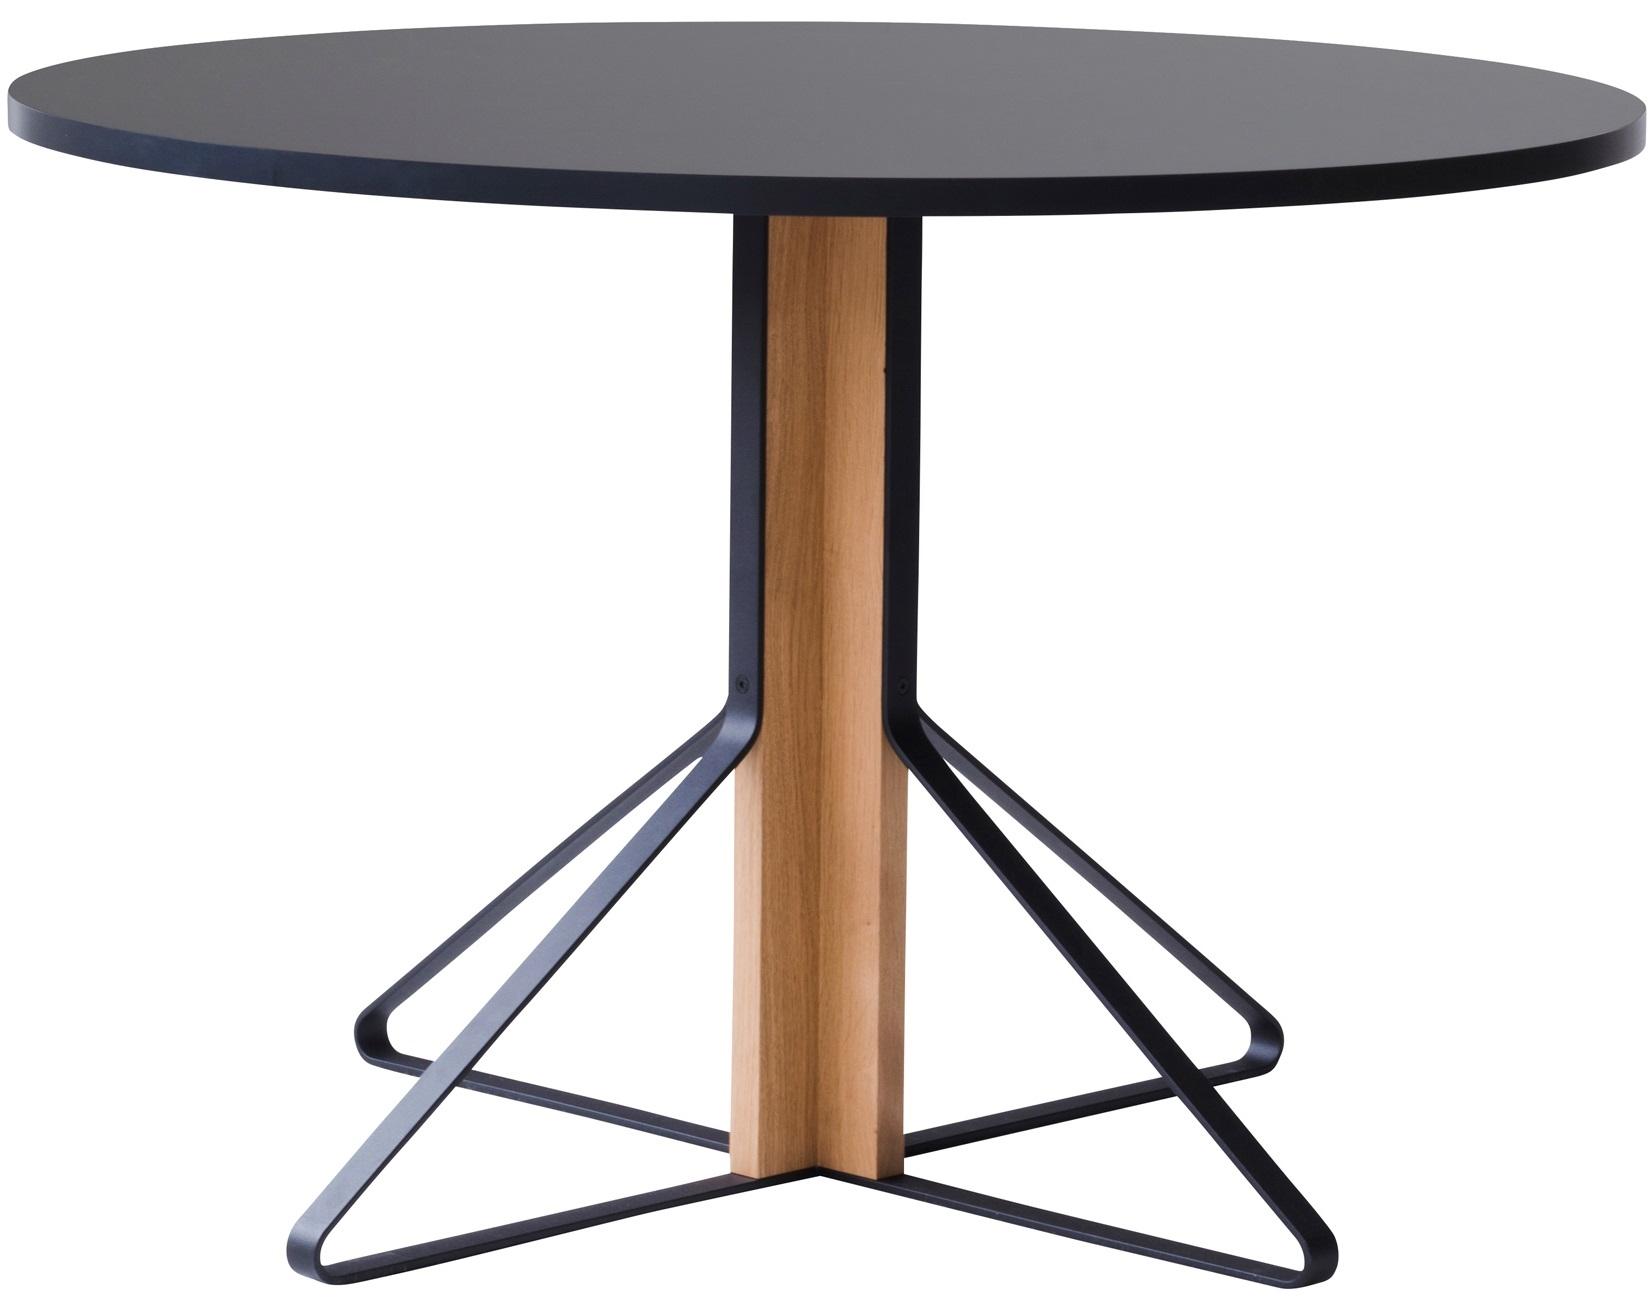 Artek designové jídelní stoly Kaari Table Round (průměr 110 cm)